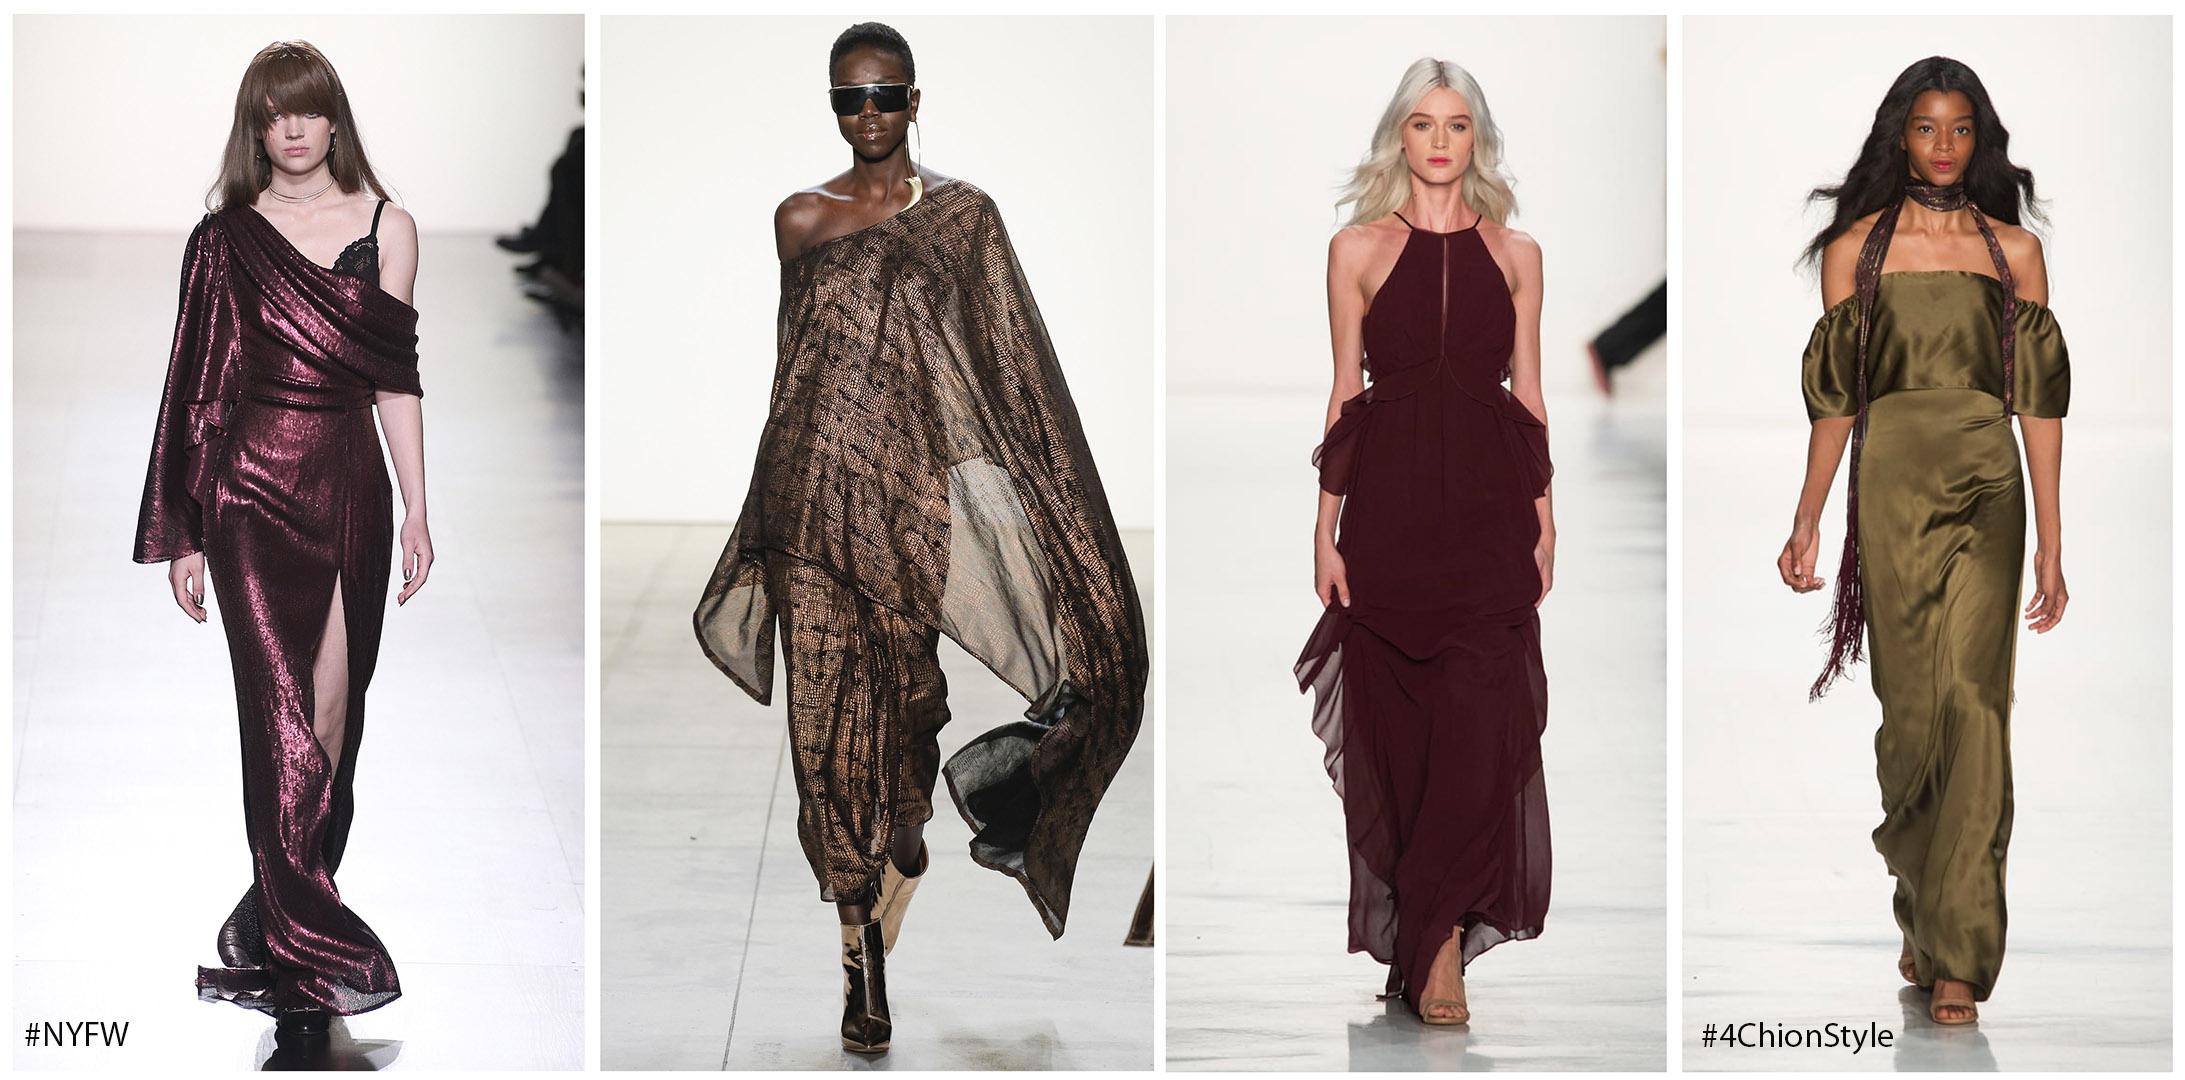 nyfw-new-york-fashion-day-1-4chion-lifestyle-shoulder